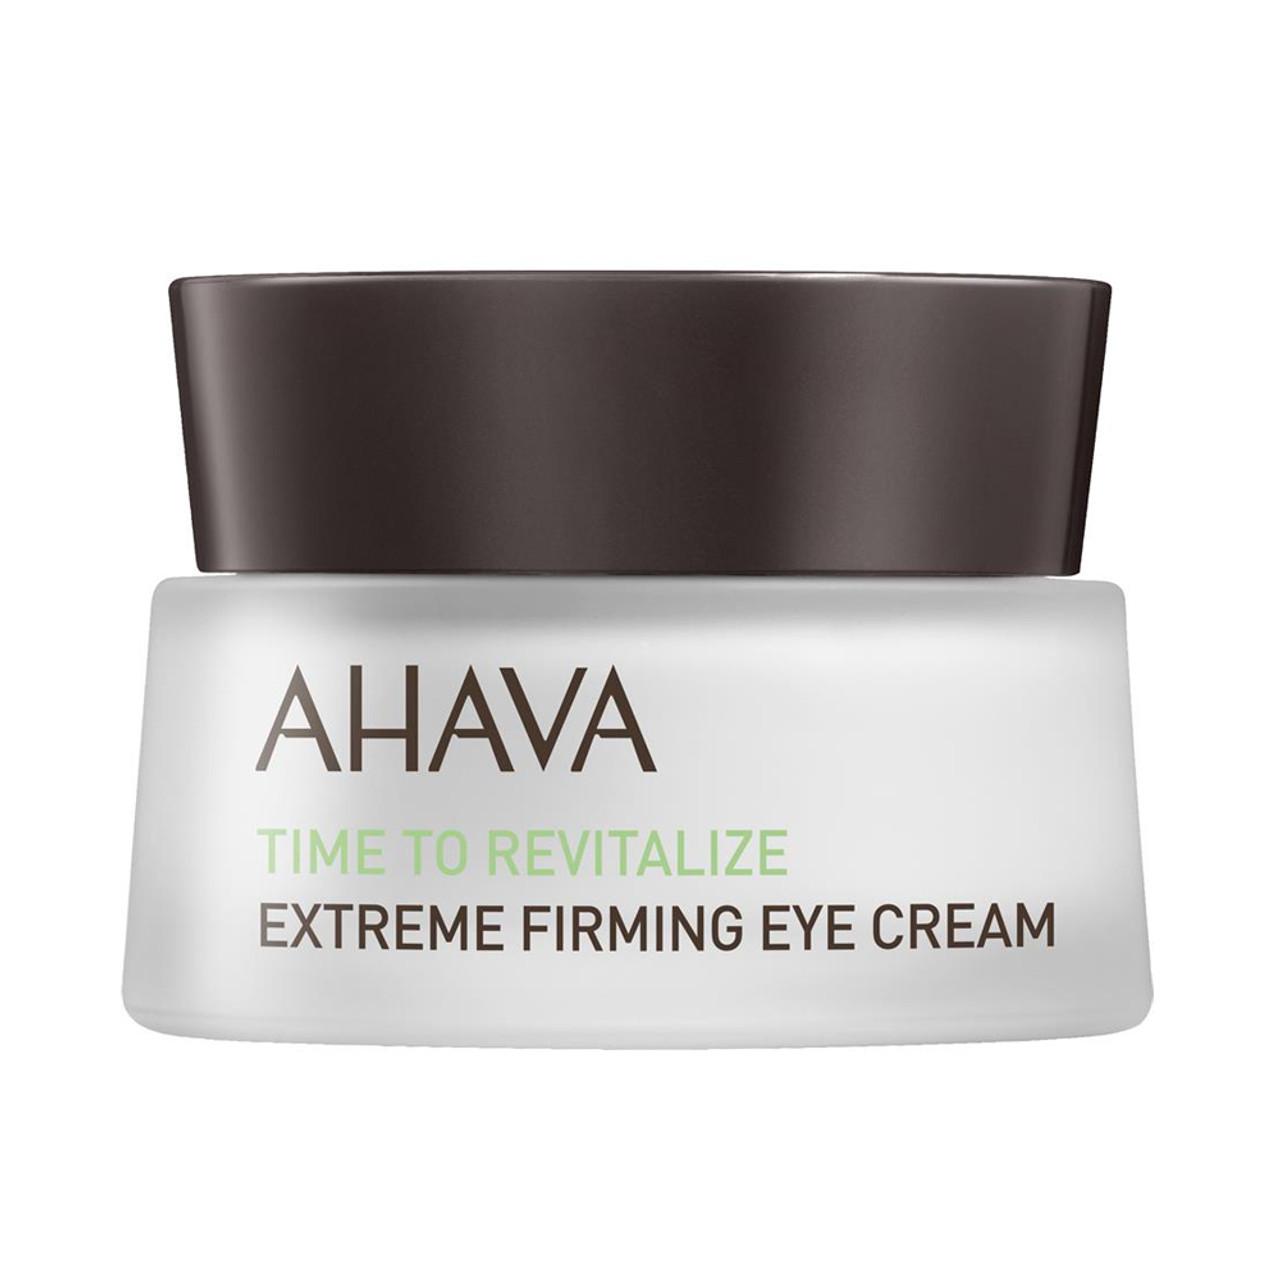 AHAVA Extreme Firming Eye Cream BeautifiedYou.com